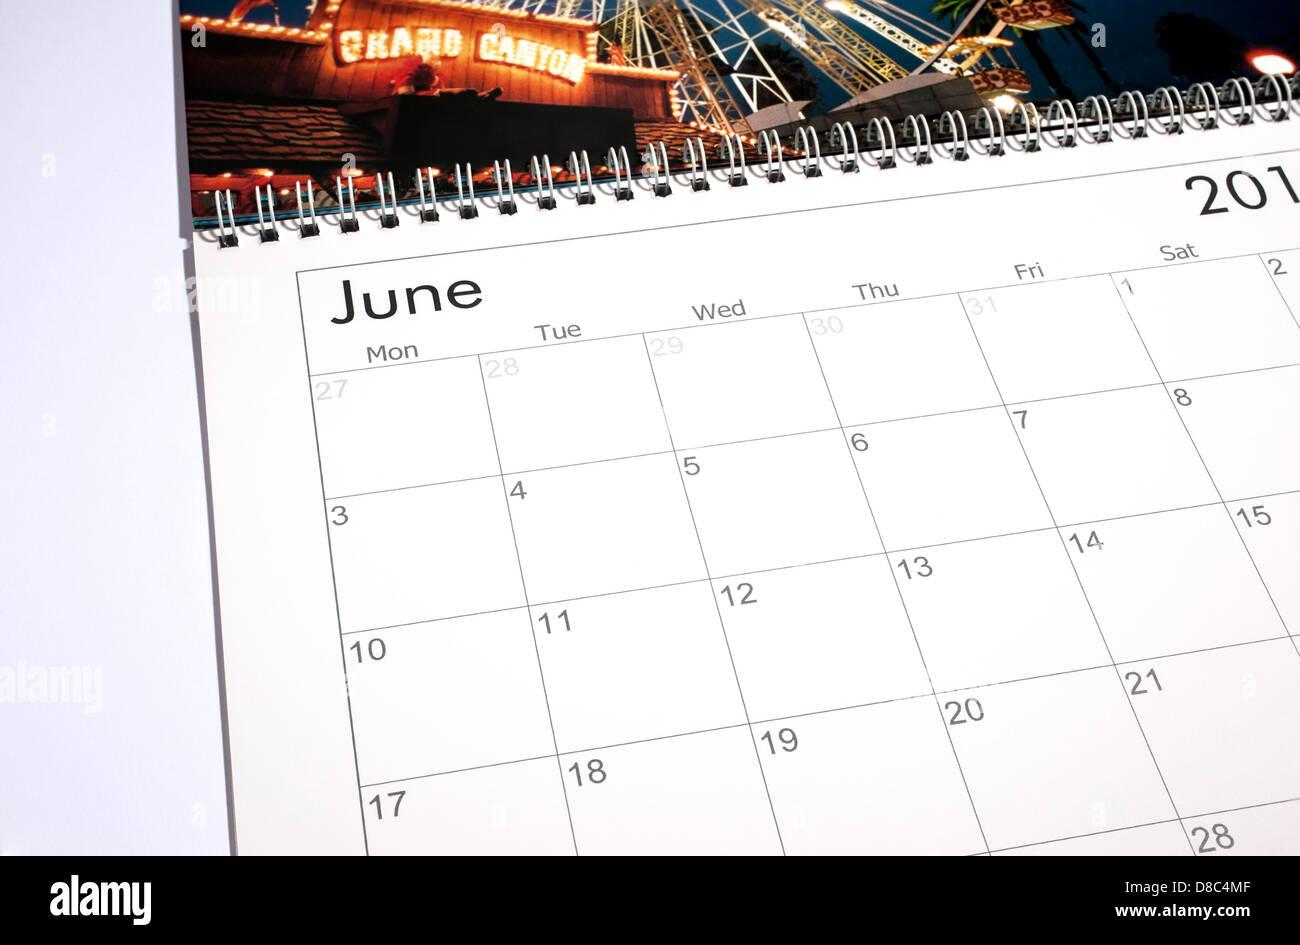 Blank calendar page June 2013 - Stock Image